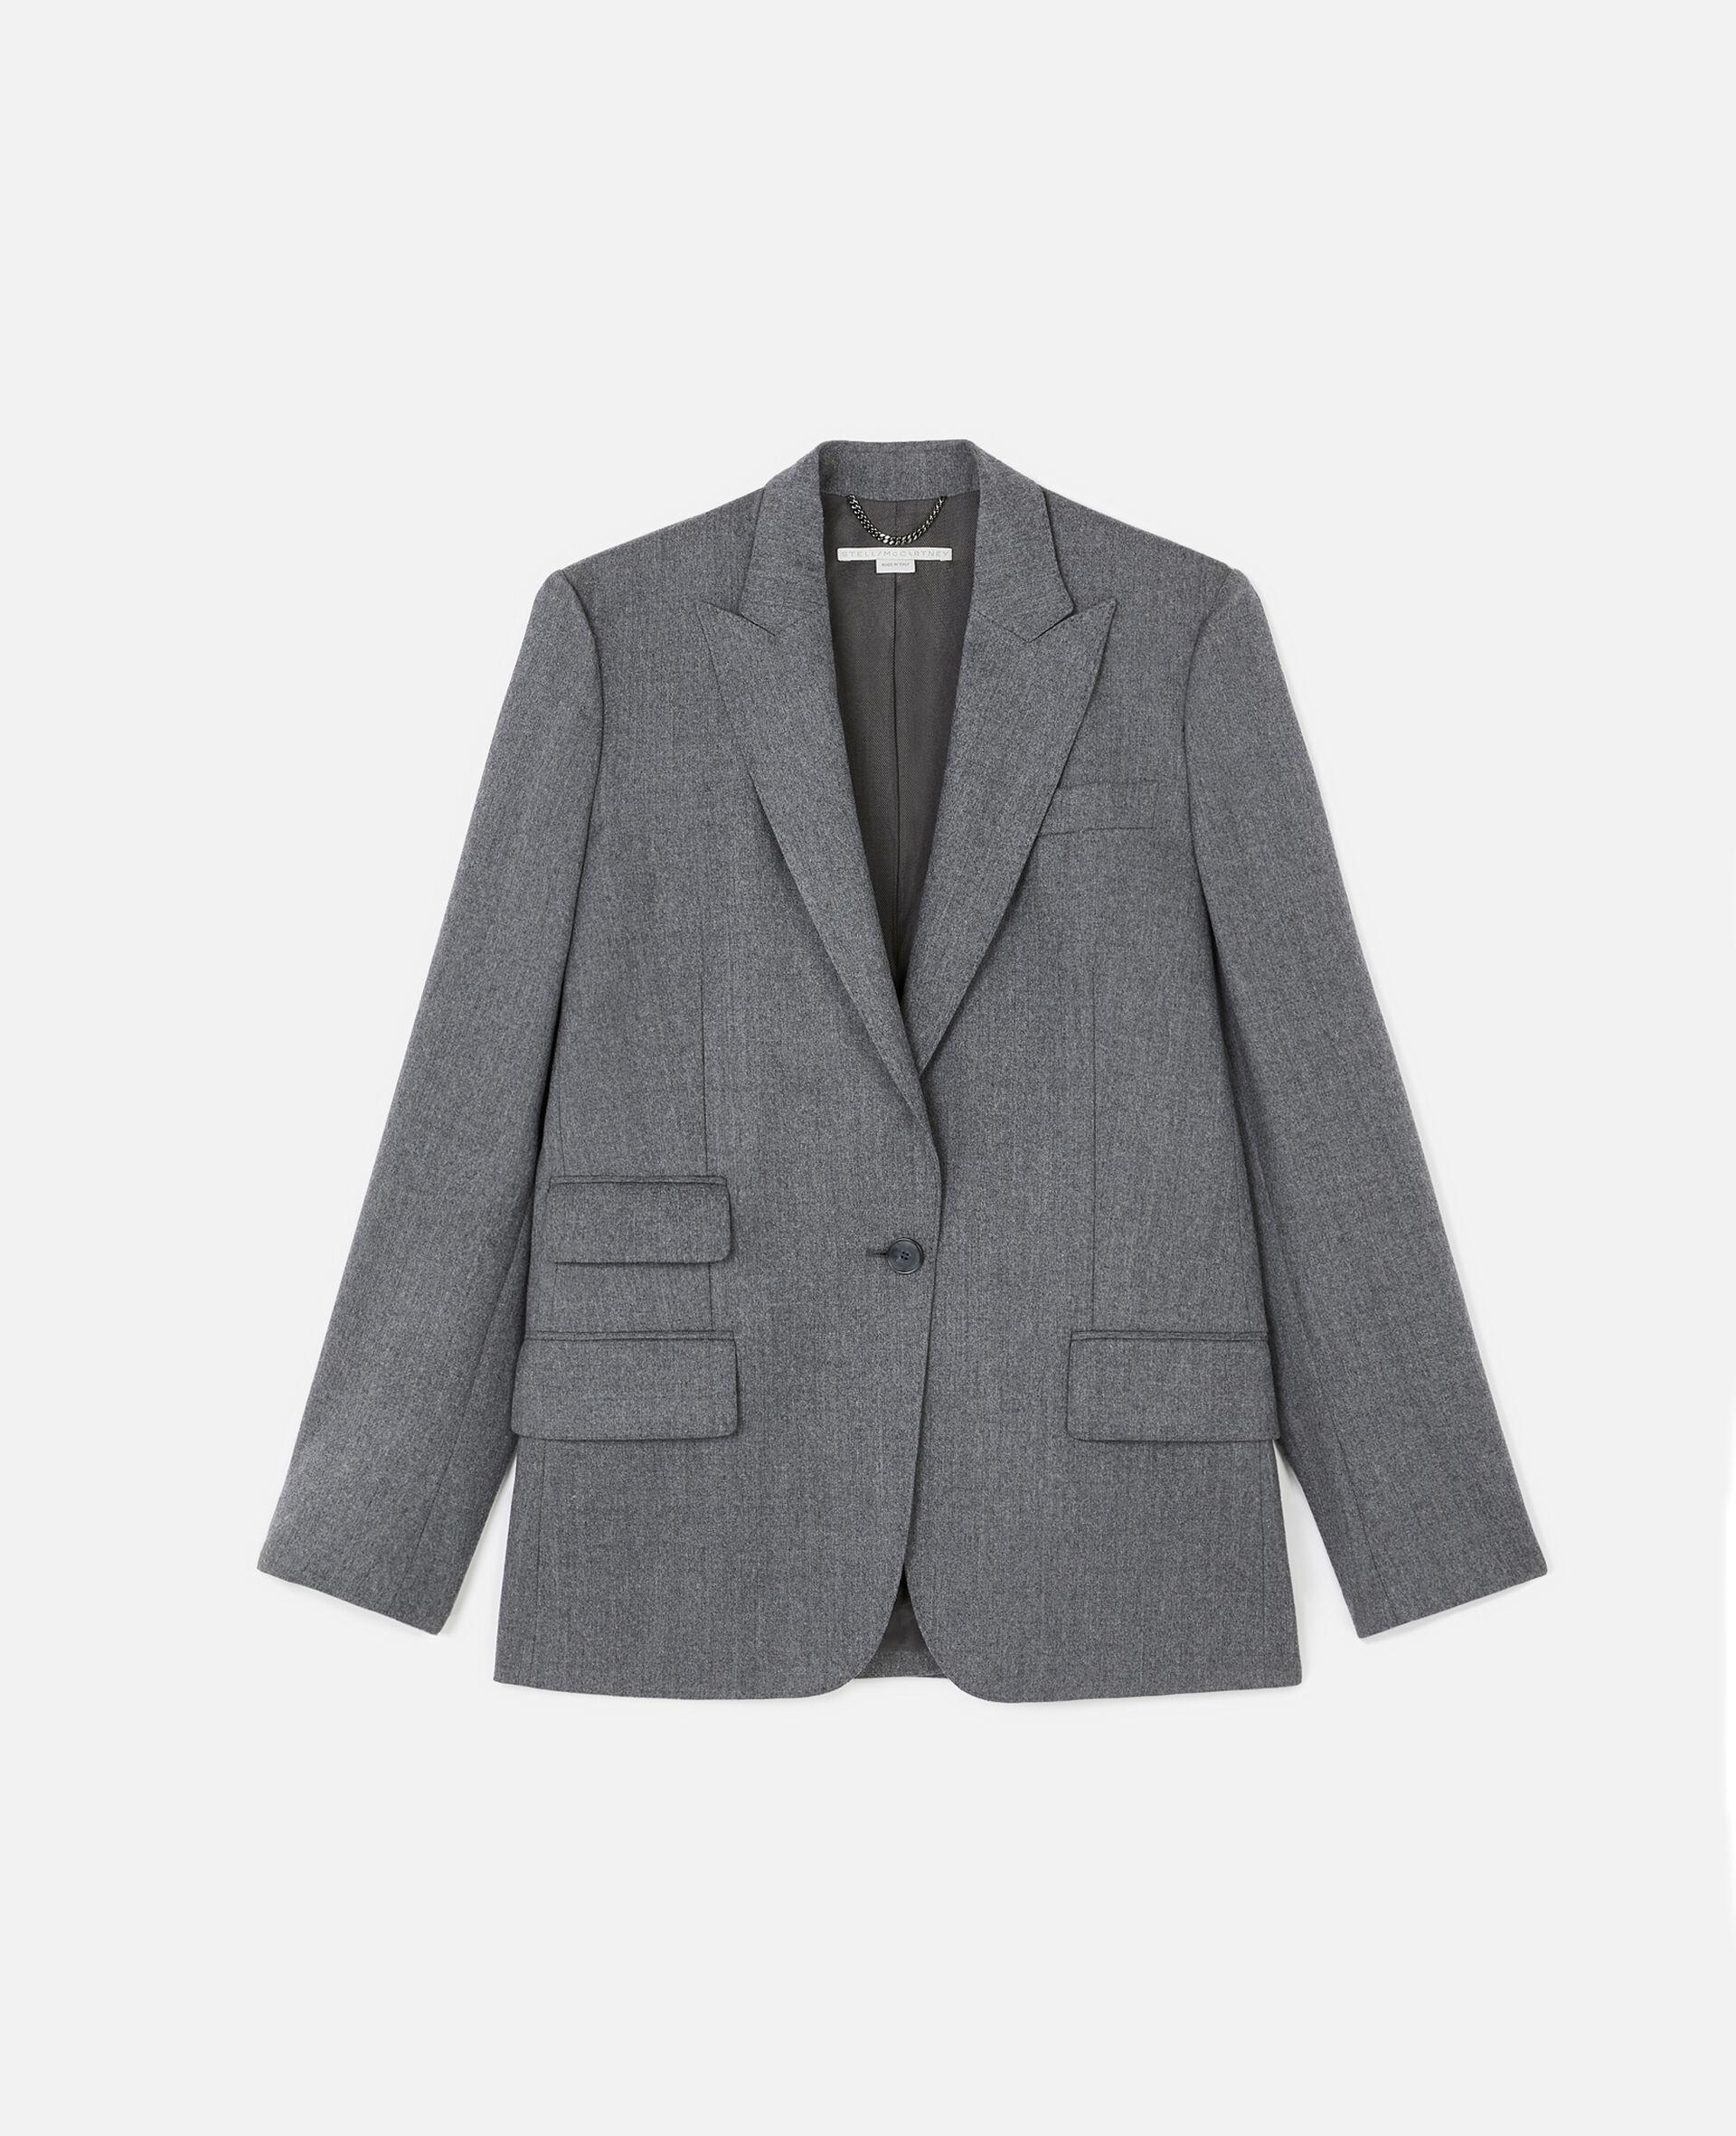 Tailored Bell Jacket -Grau-large image number 0